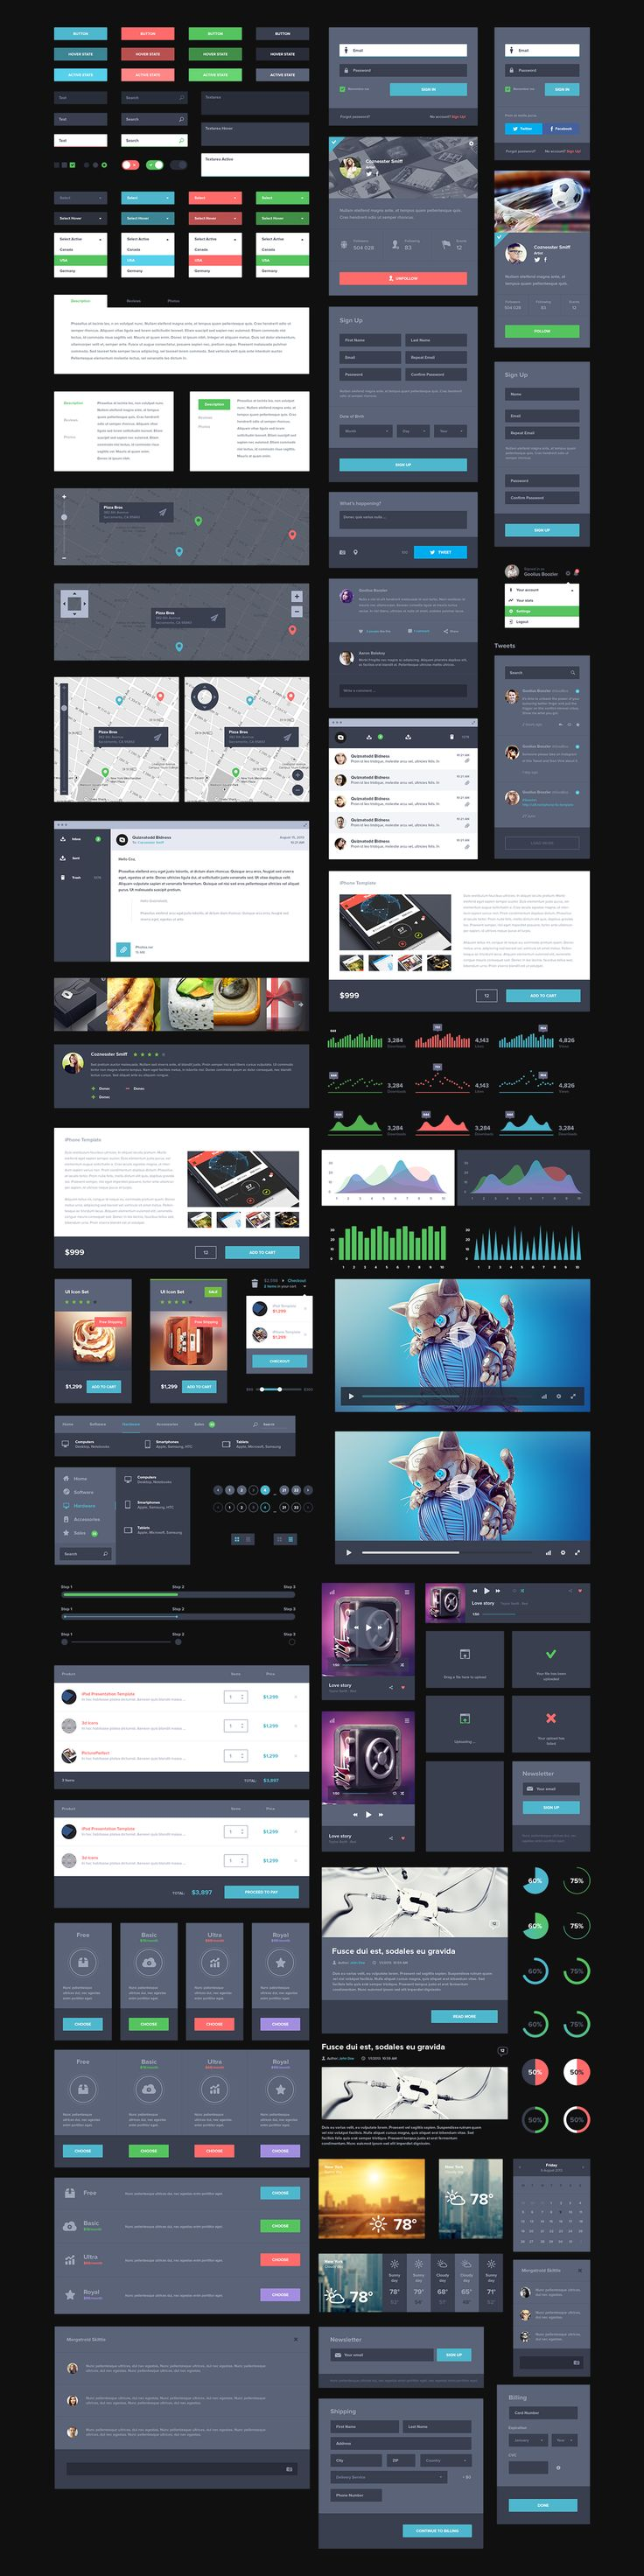 UI Kit Dark [Free] by Creativedash